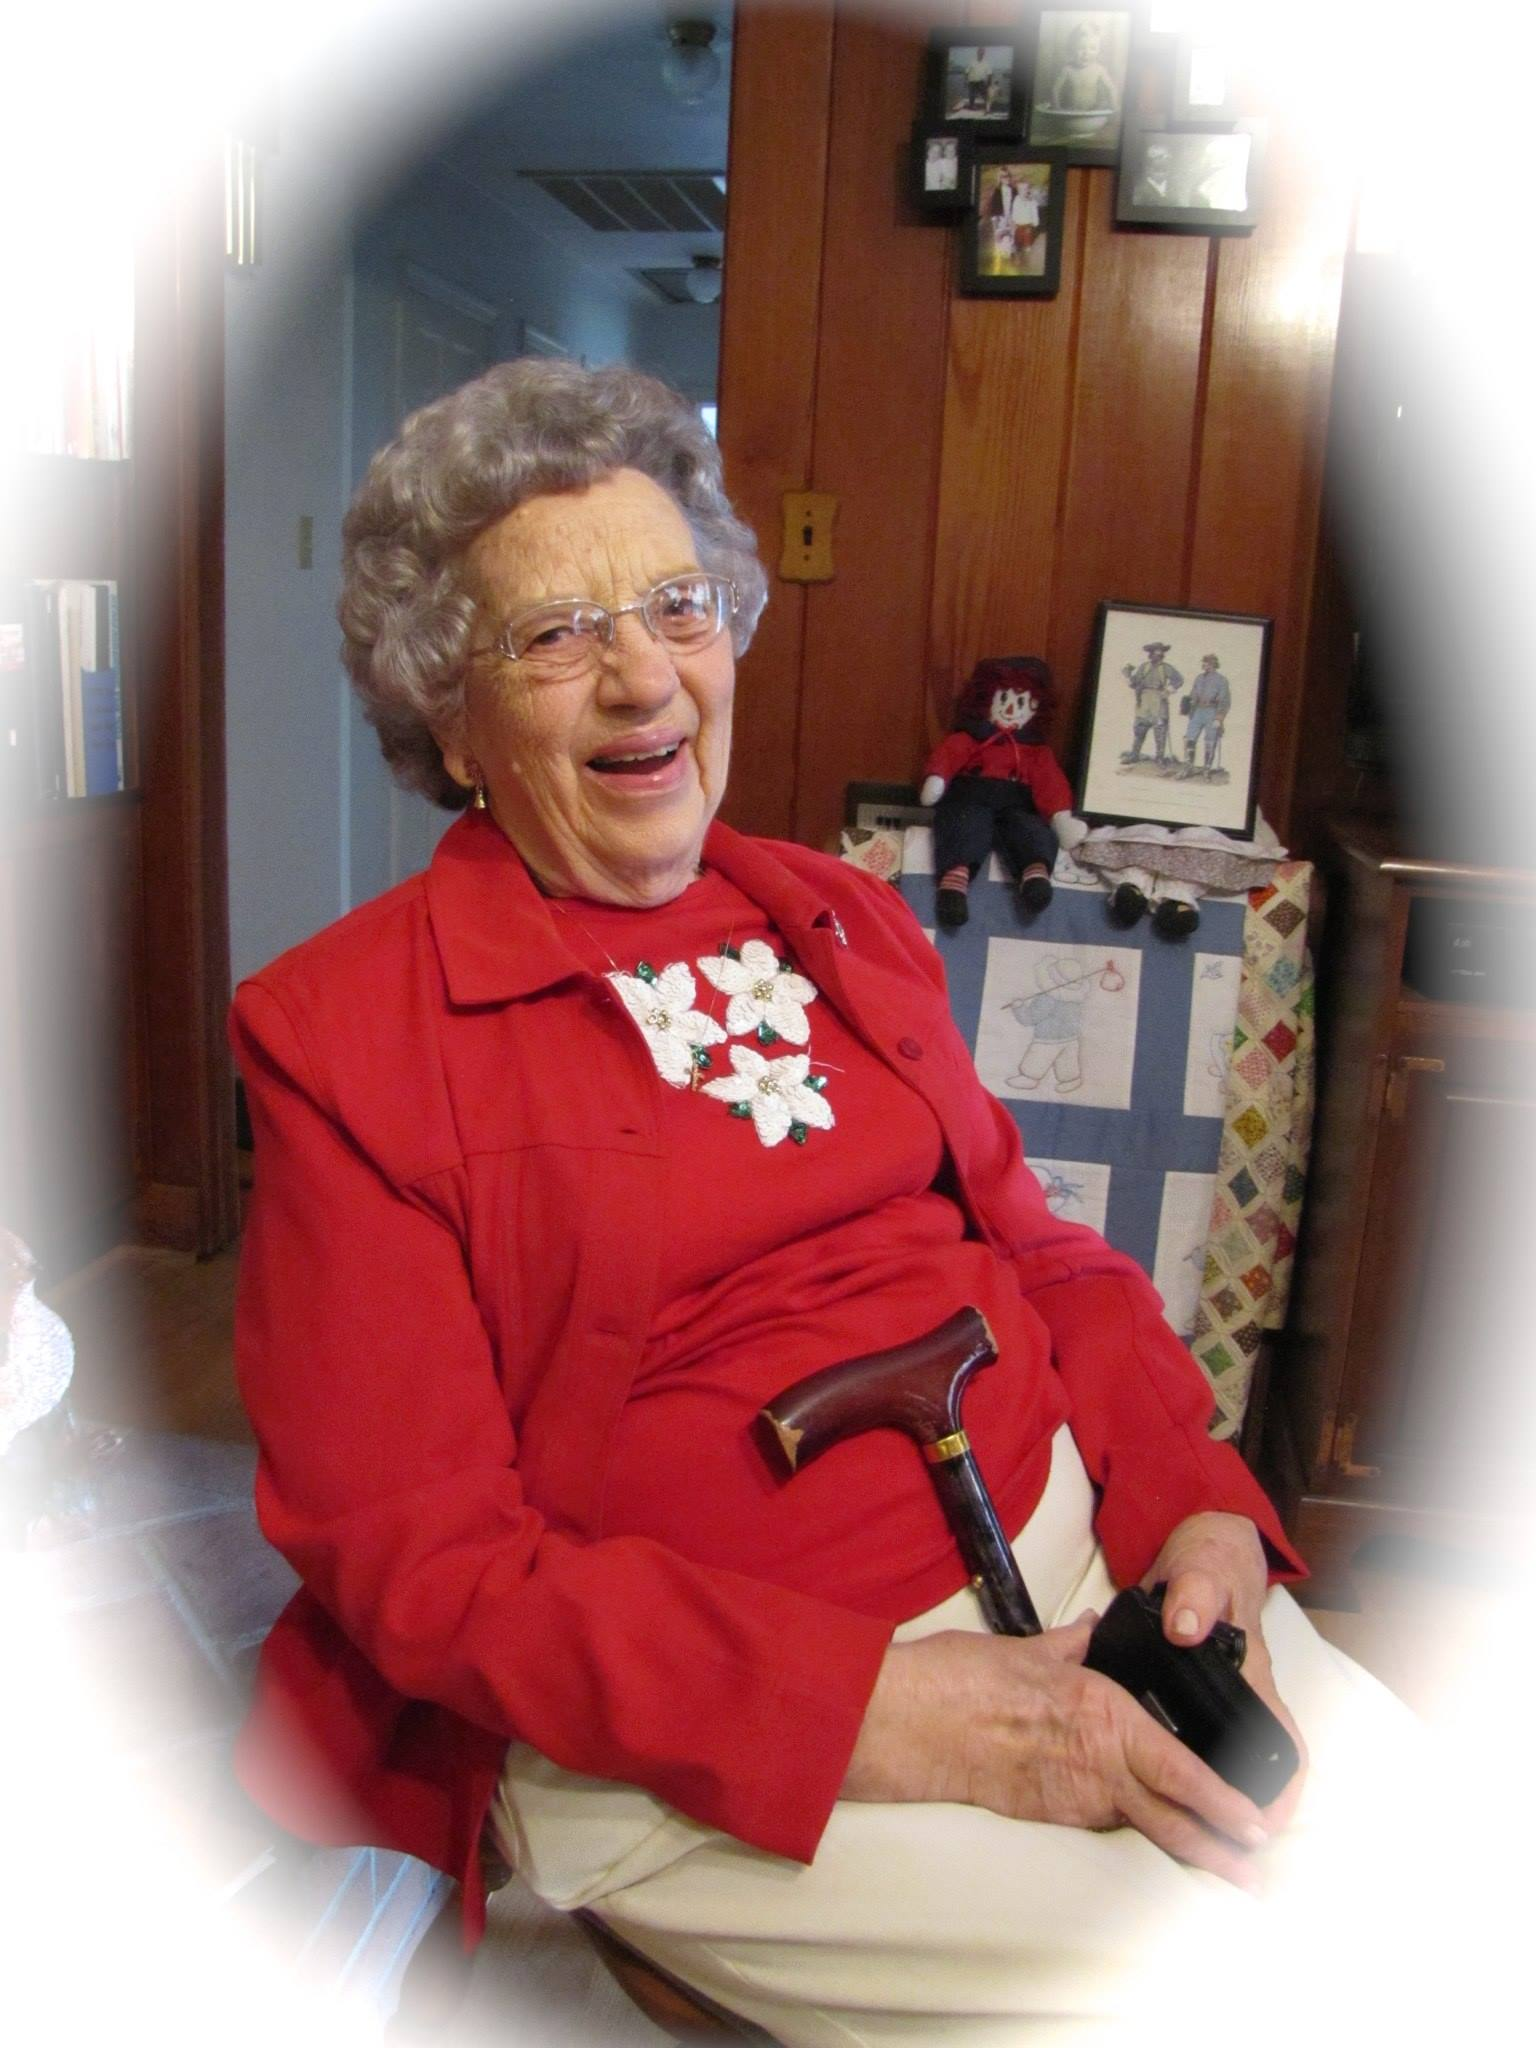 Dorothy Hubbard Chilton - October 19, 1929 – November 23, 2014